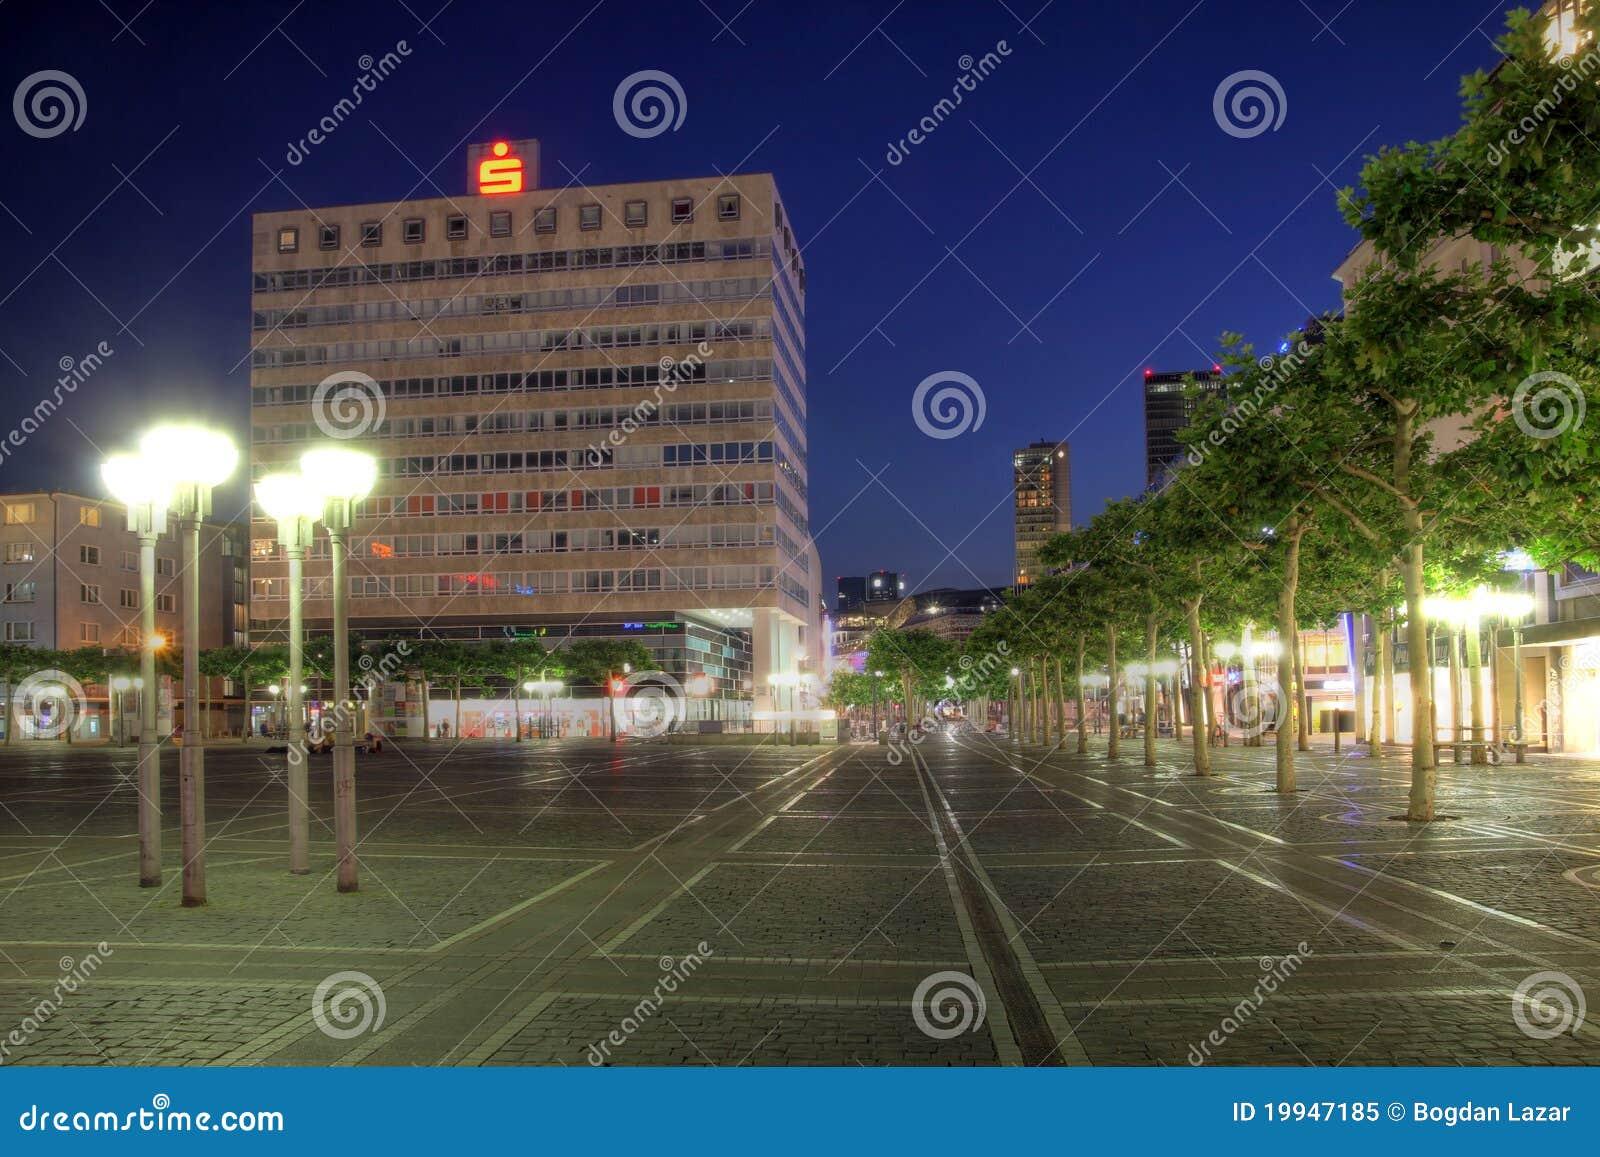 Quadrato di Konstablerwache, Francoforte, Germania